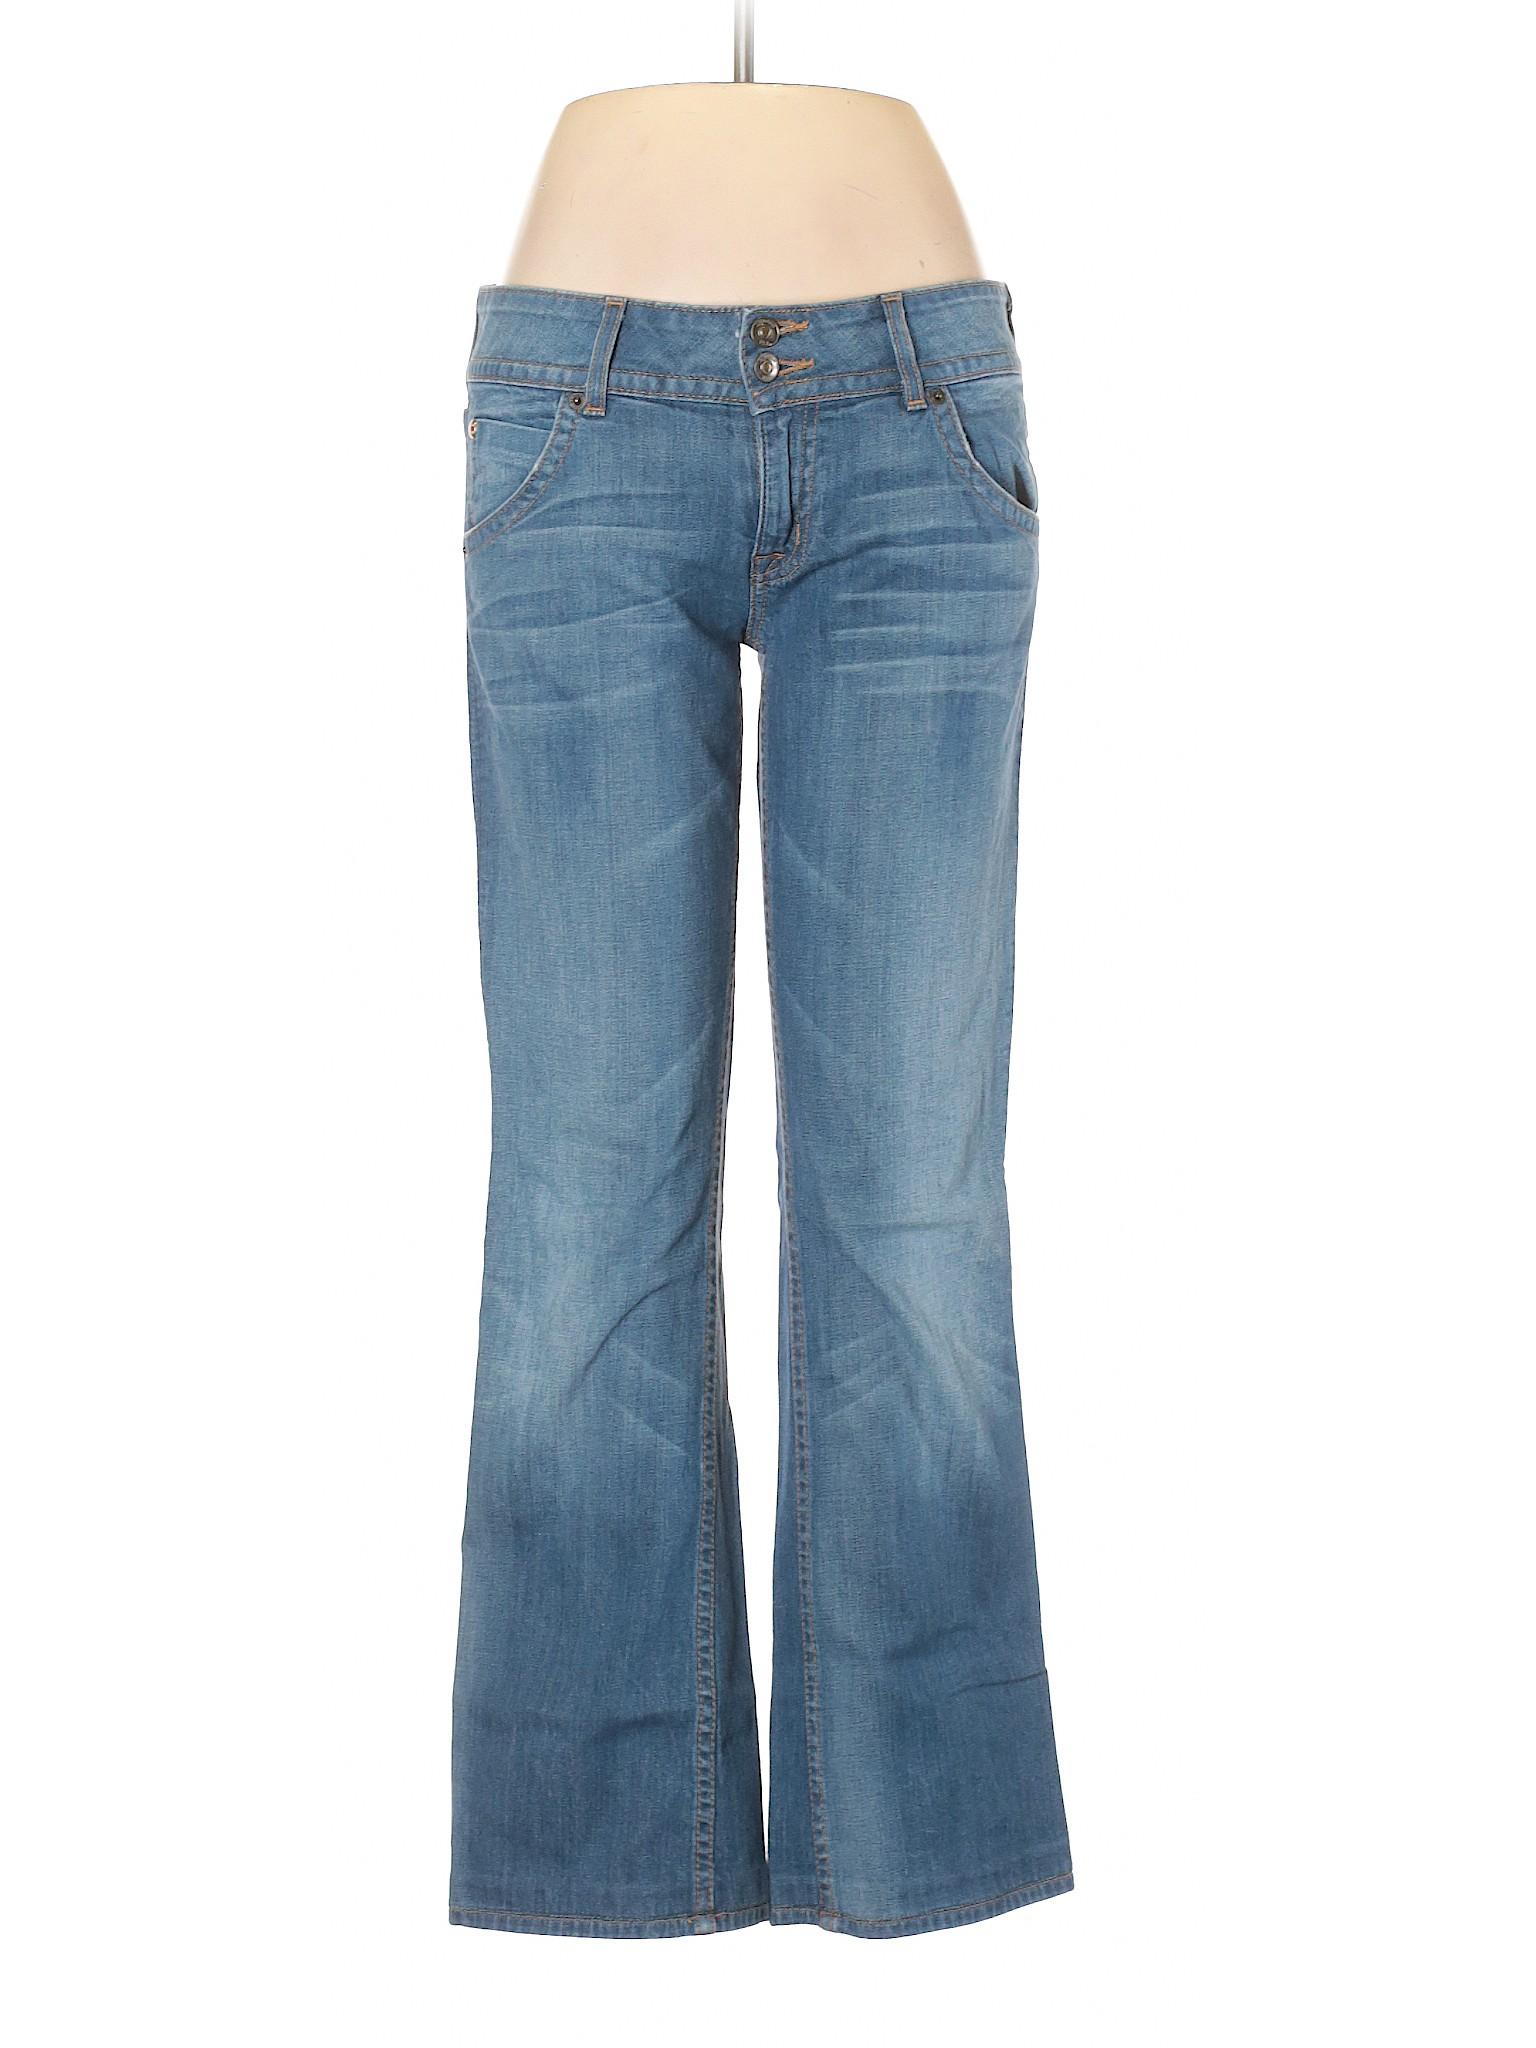 Hudson Promotion Promotion Jeans Promotion Hudson Promotion Hudson Hudson Jeans Jeans w8Pwvq1